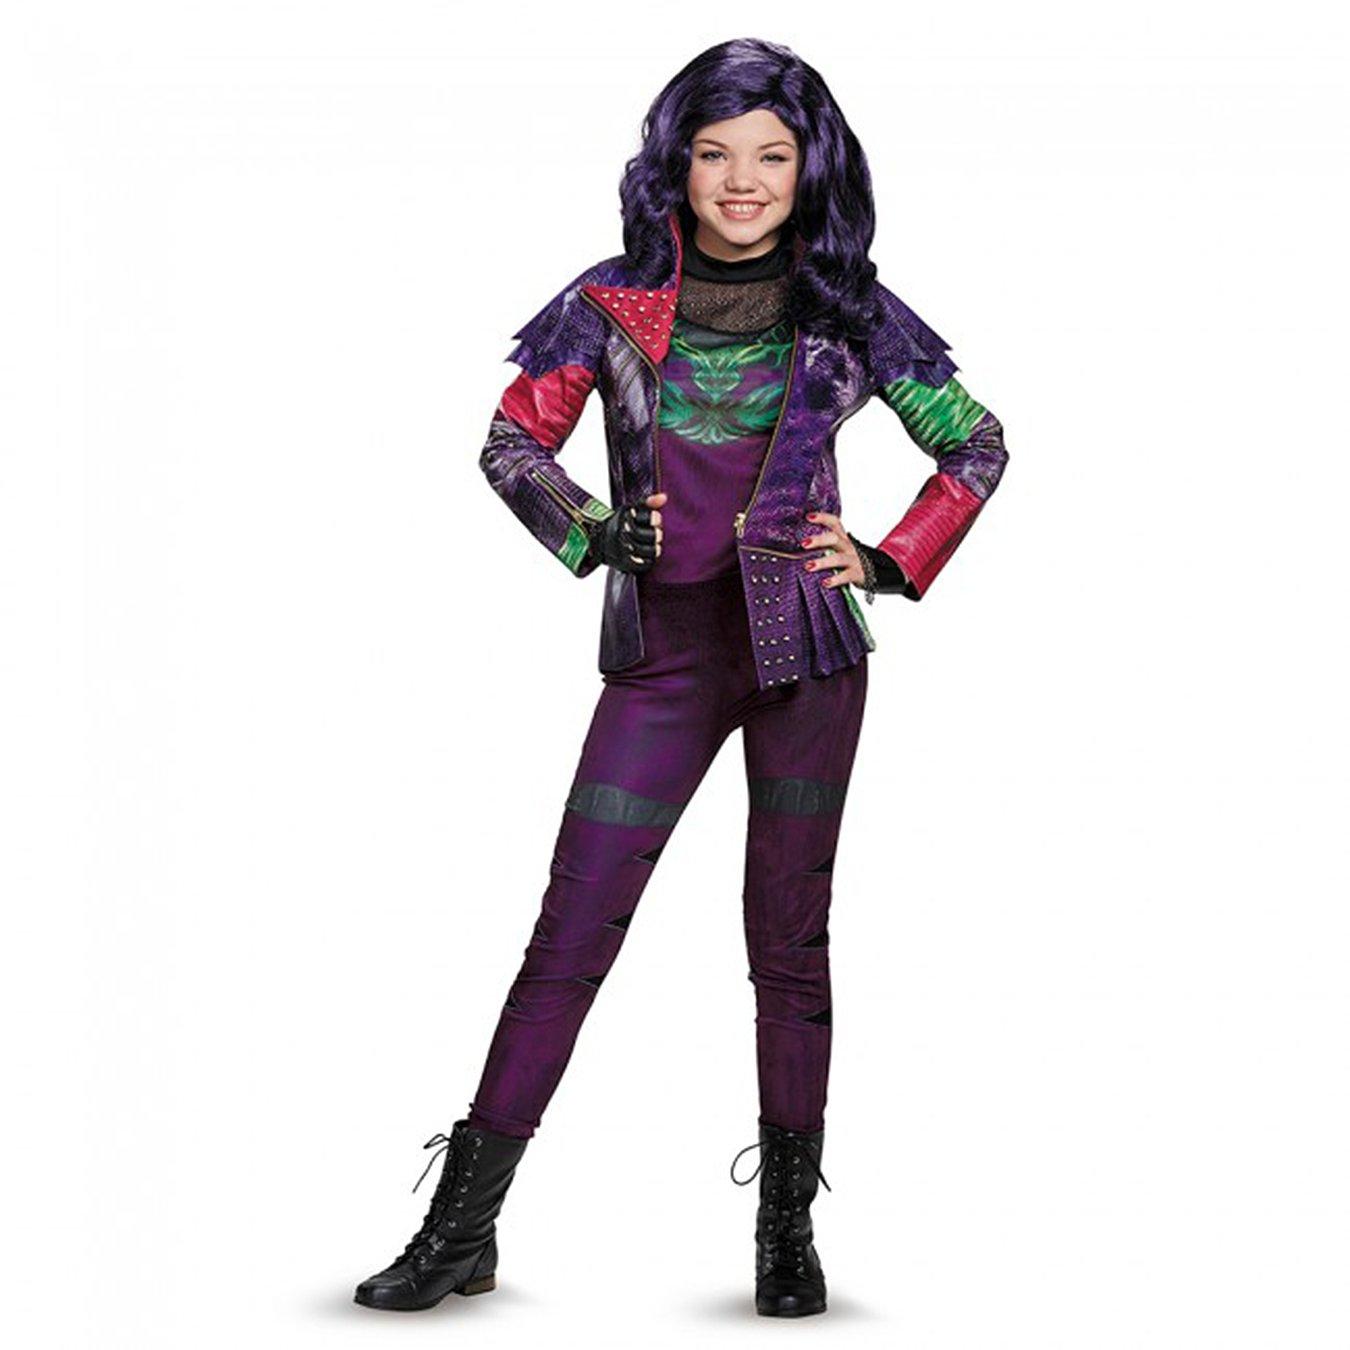 amazoncom disguise mal prestige descendants disney costume large10 12 toys games